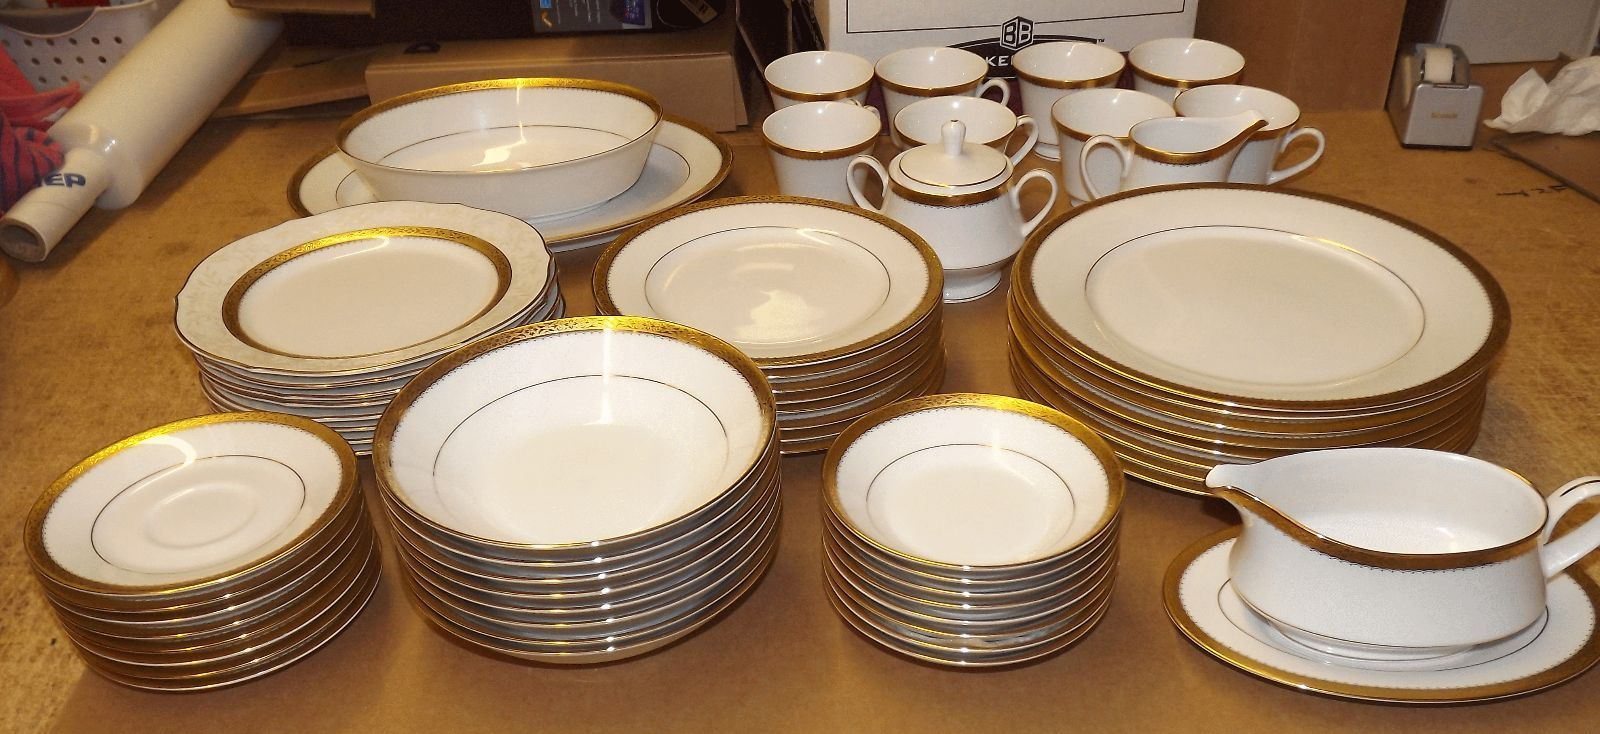 Noritake Essex Gold Dinnerware Service for 8 picclick.com